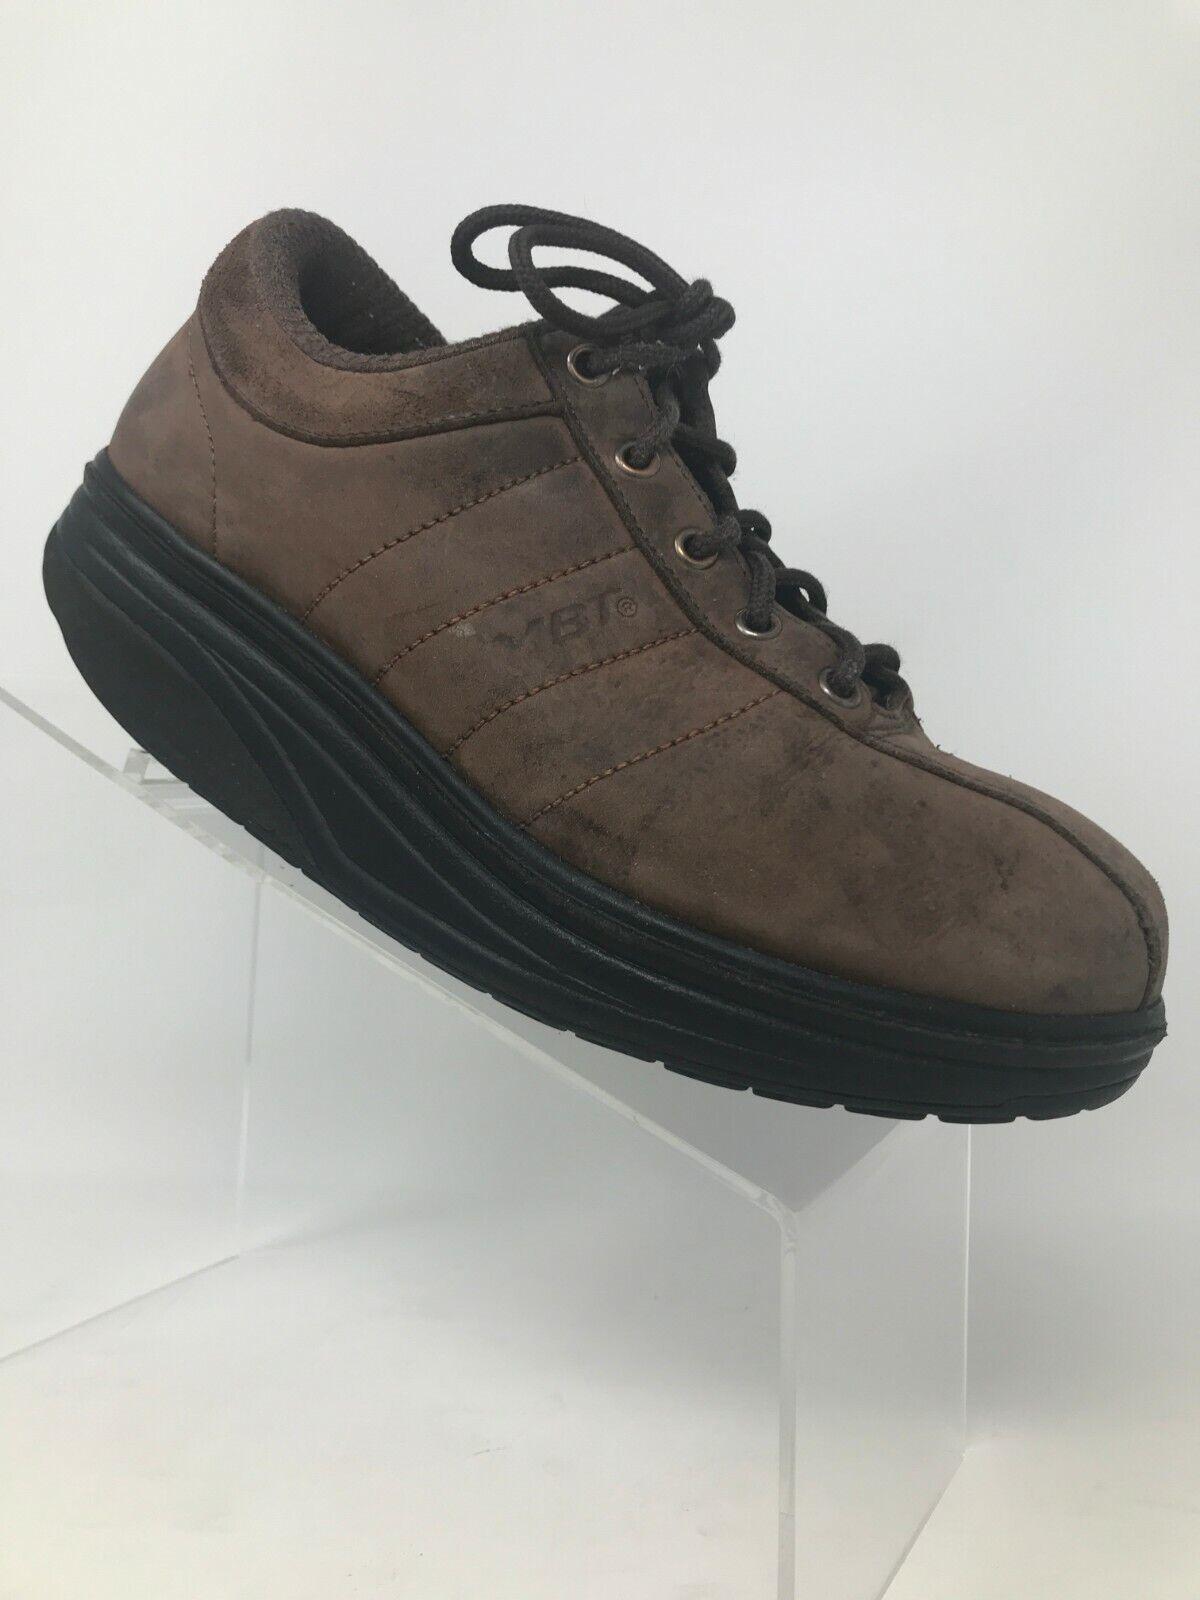 MBT Shoes Lace Up Bicycle Toe Brown Leather Walking Toning Rocking Men US 7-7.5